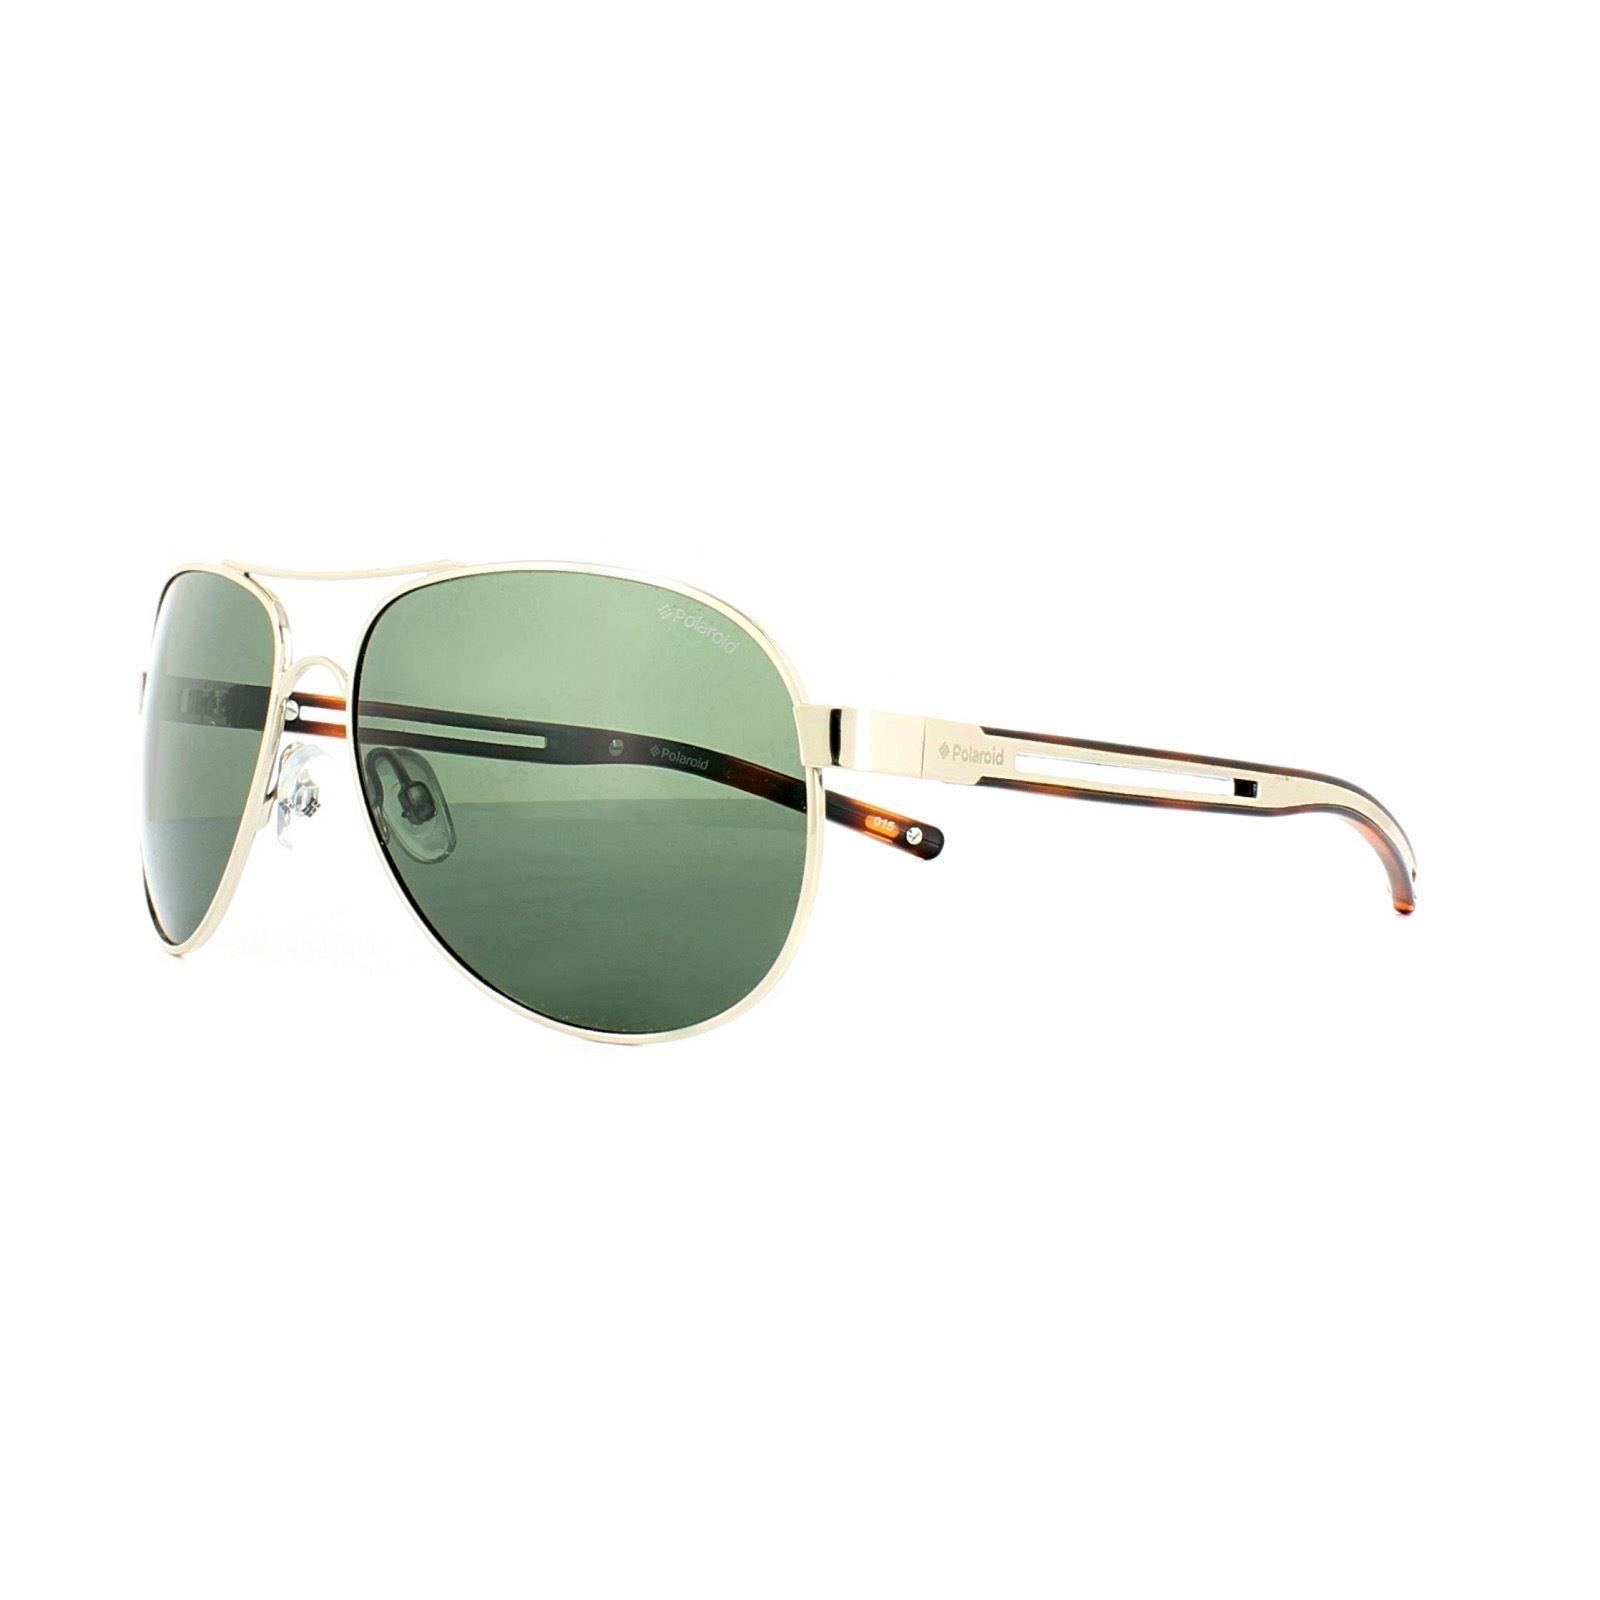 Polaroid Sunglasses PLD 3006/S QCV H8 Grey Green Polarized